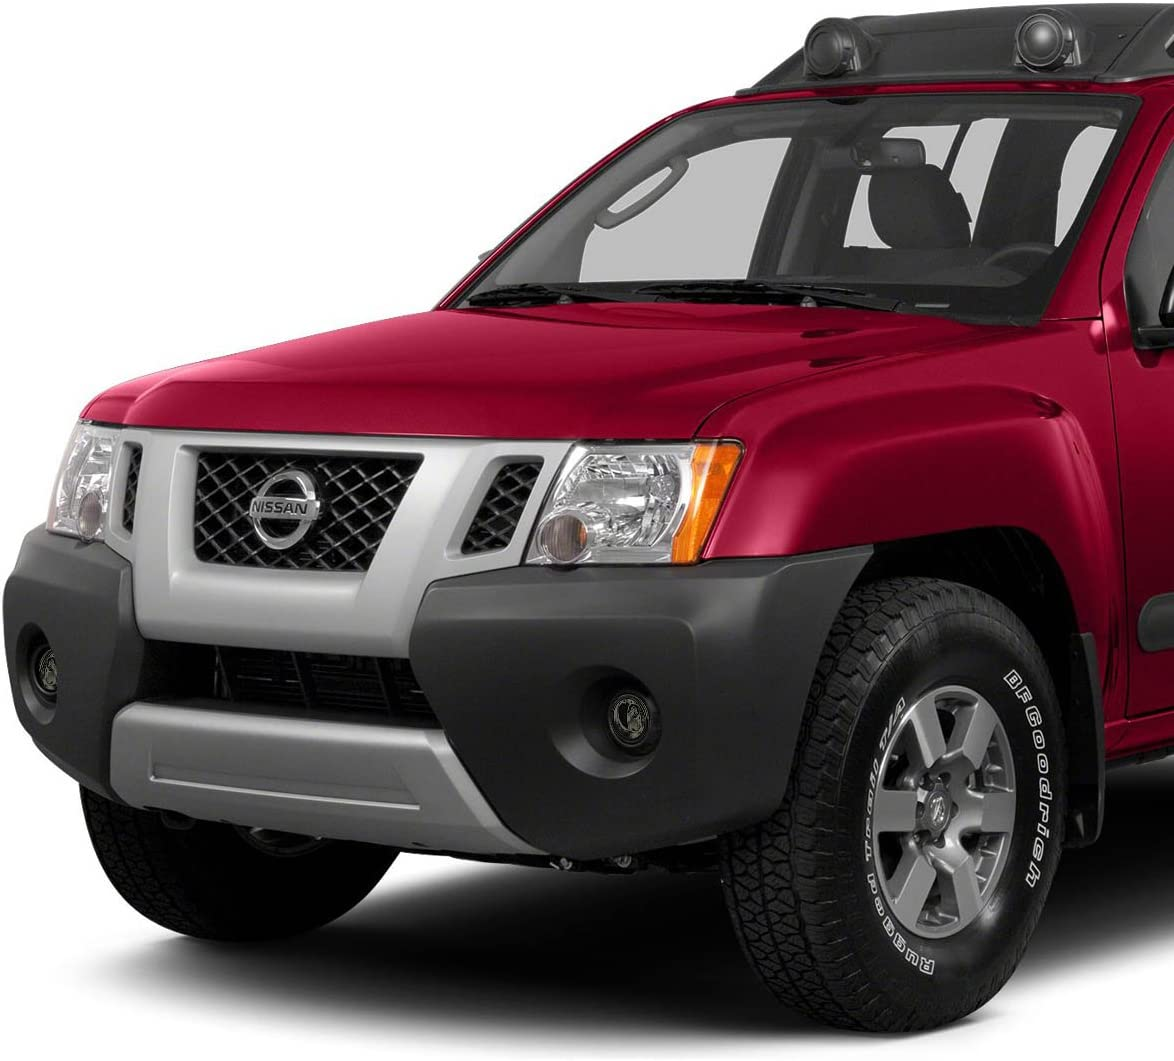 Replace for 05-18 Nissan Frontier//Xterra DNA Motoring FL-NS029-SM Front Bumper Fog Light